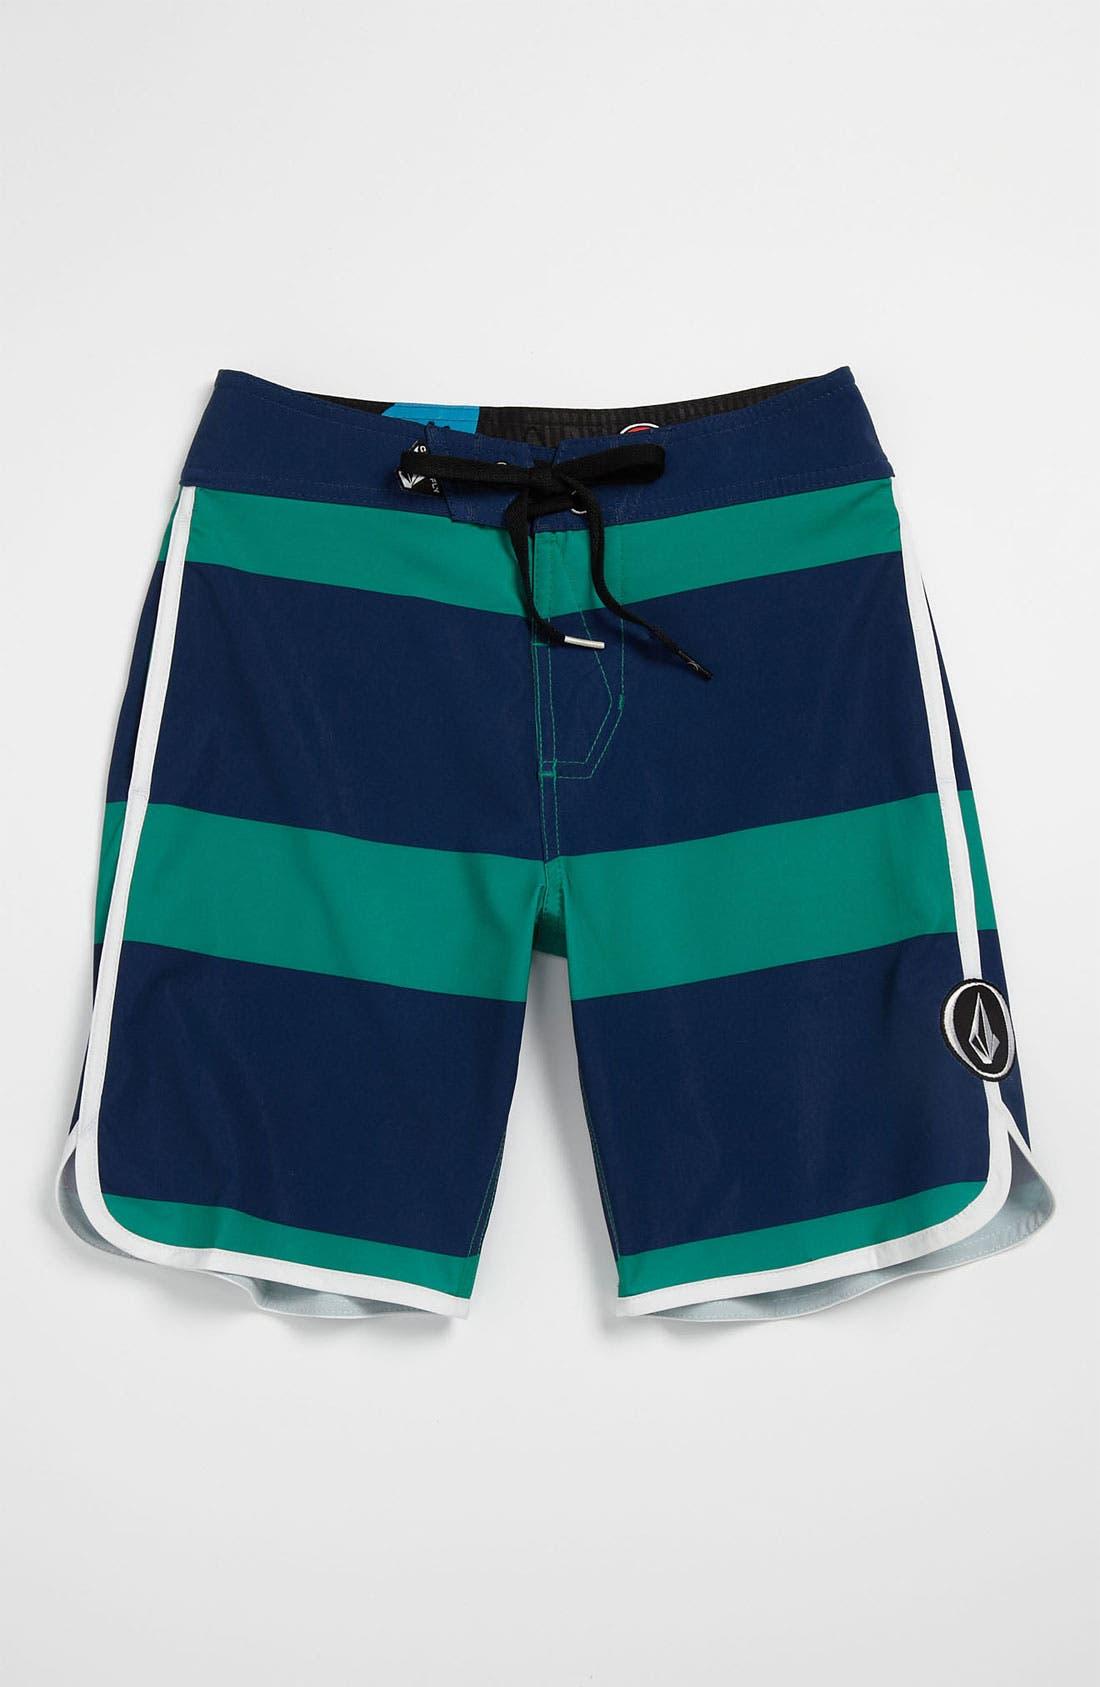 Main Image - Volcom 'Scallop' Board Shorts (Big Boys)